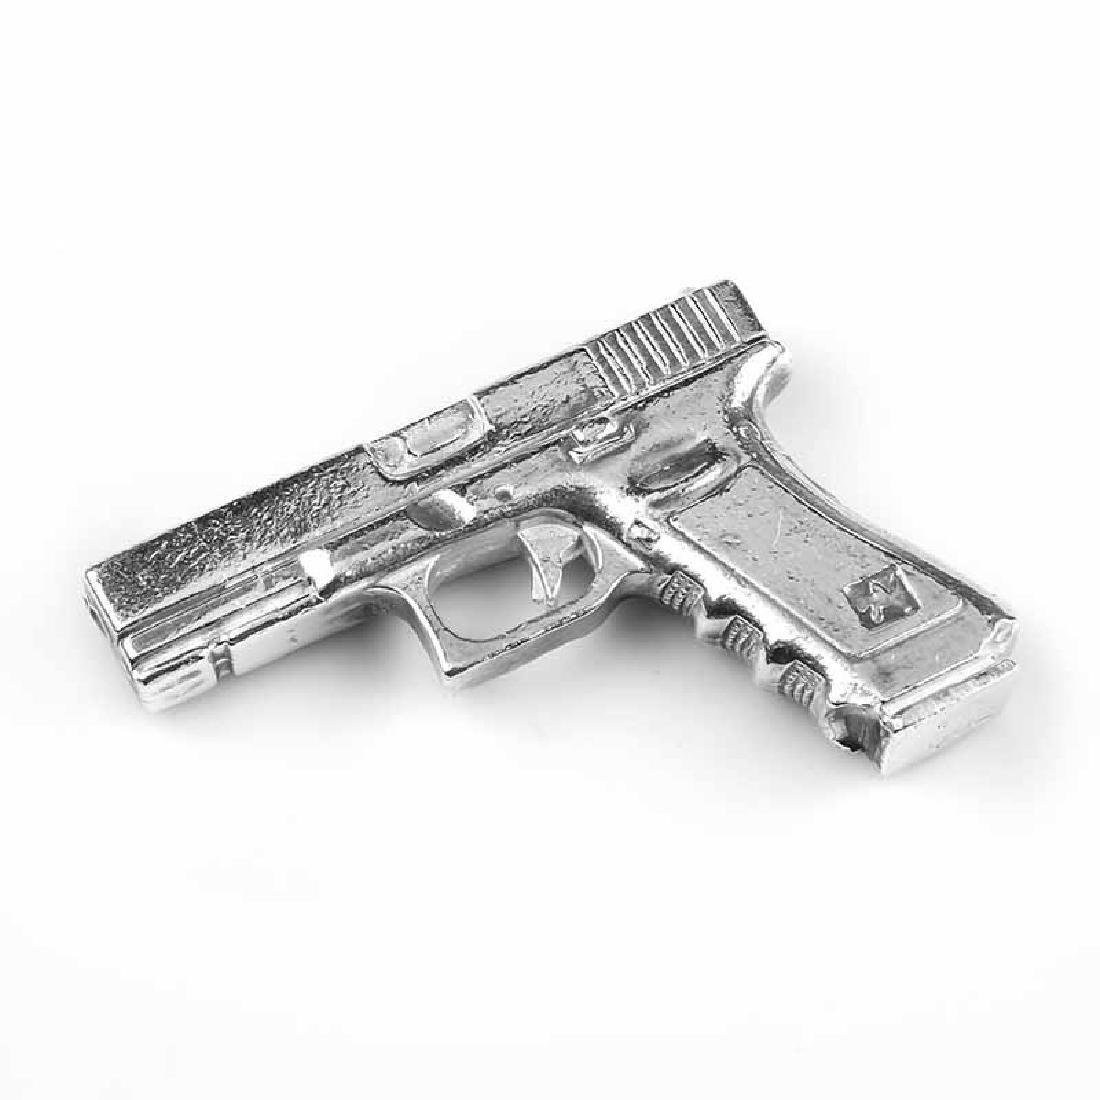 Hand Poured Silver Gun 9 oz (Miniature Size)